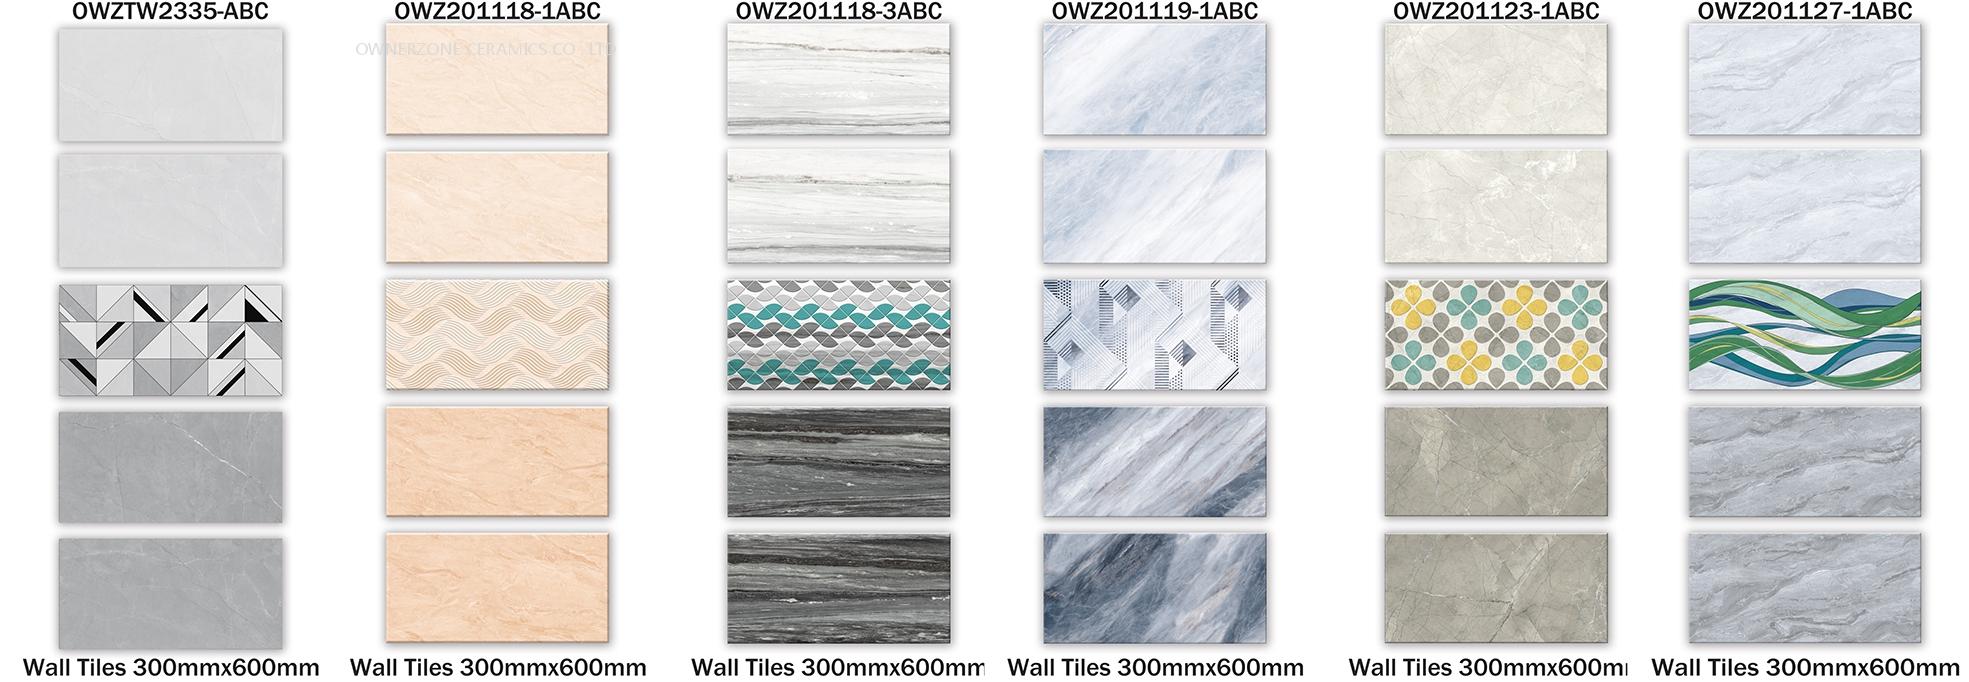 New design wall tile